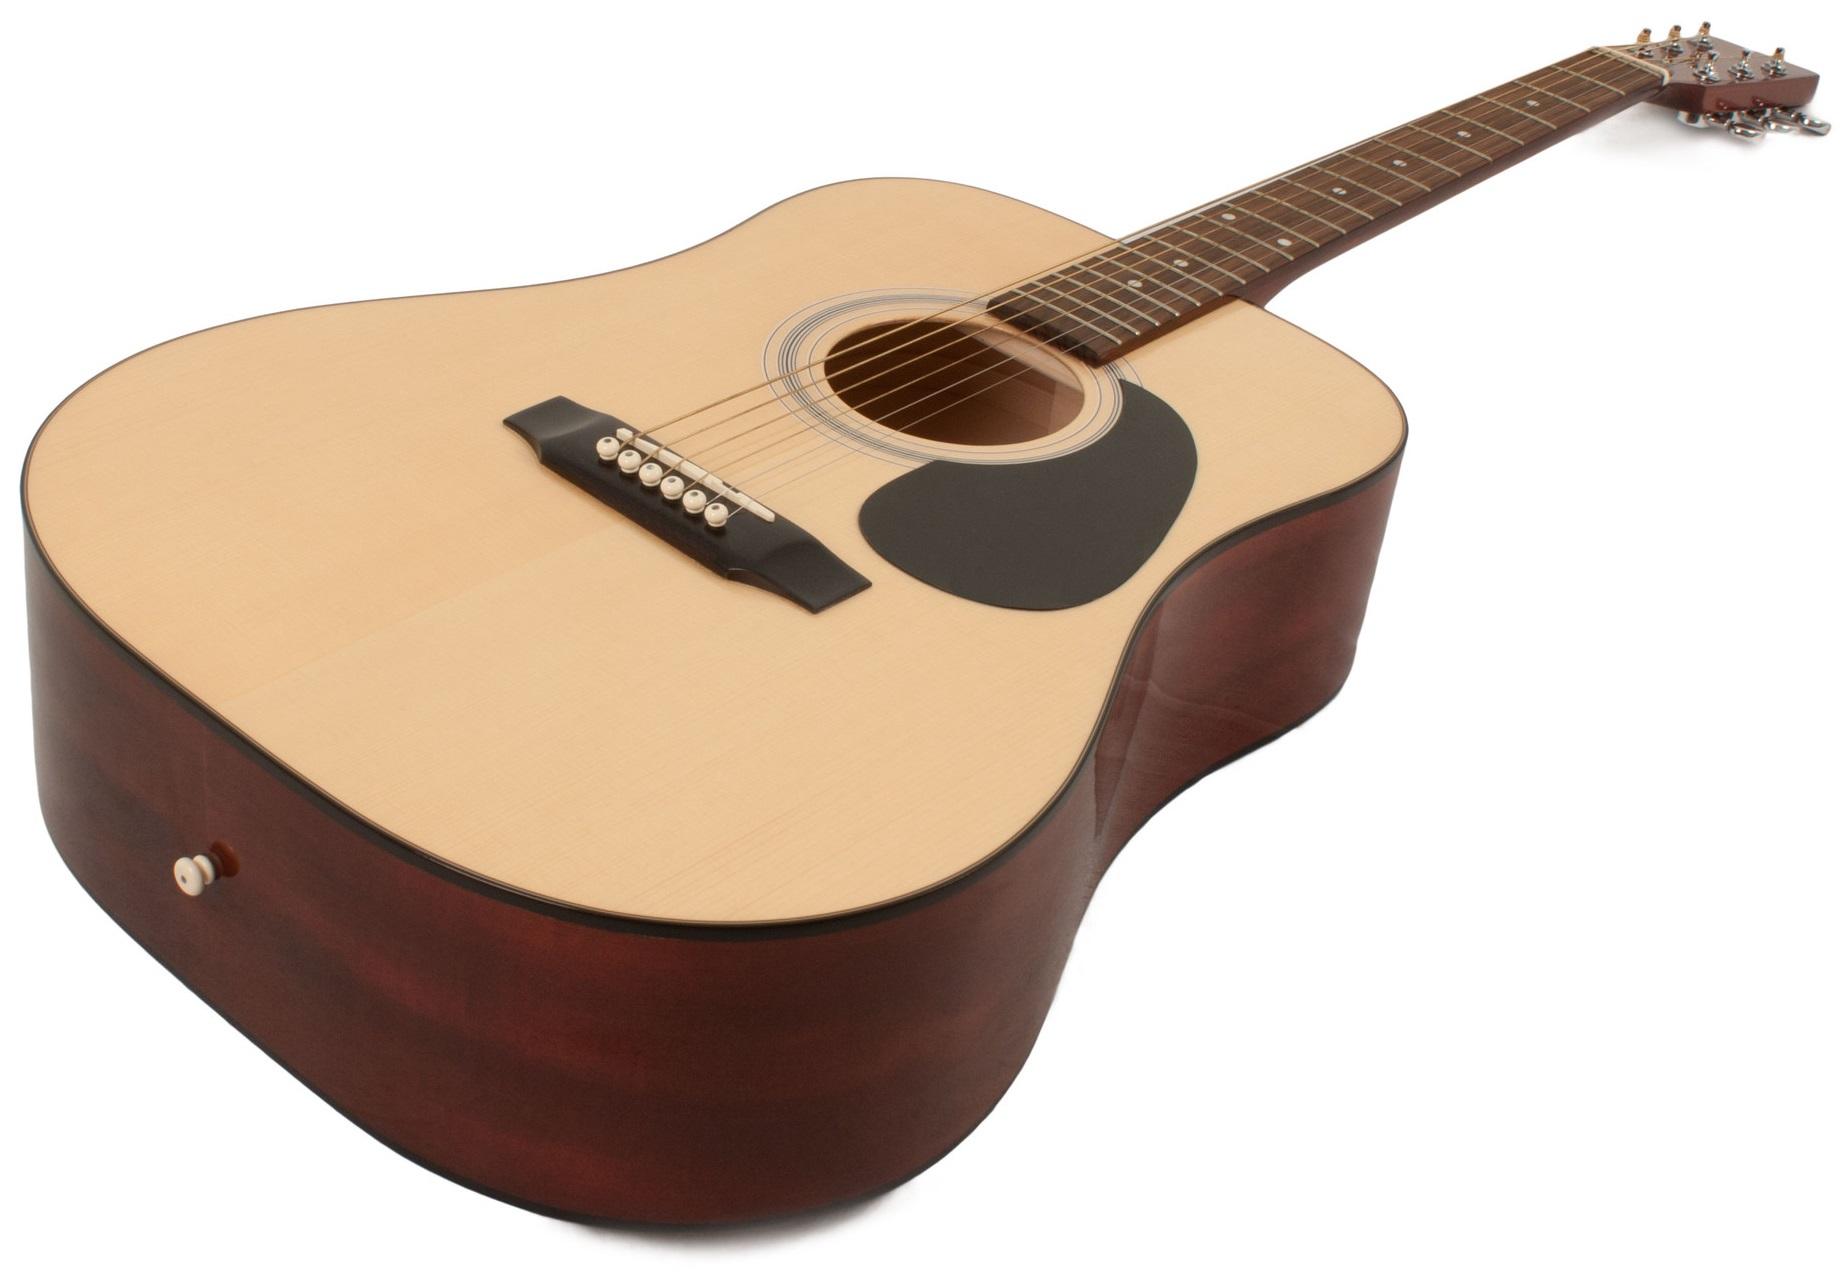 Chitarra acustica 4 4 made in europe top abete massello for Ganci per appendere chitarre